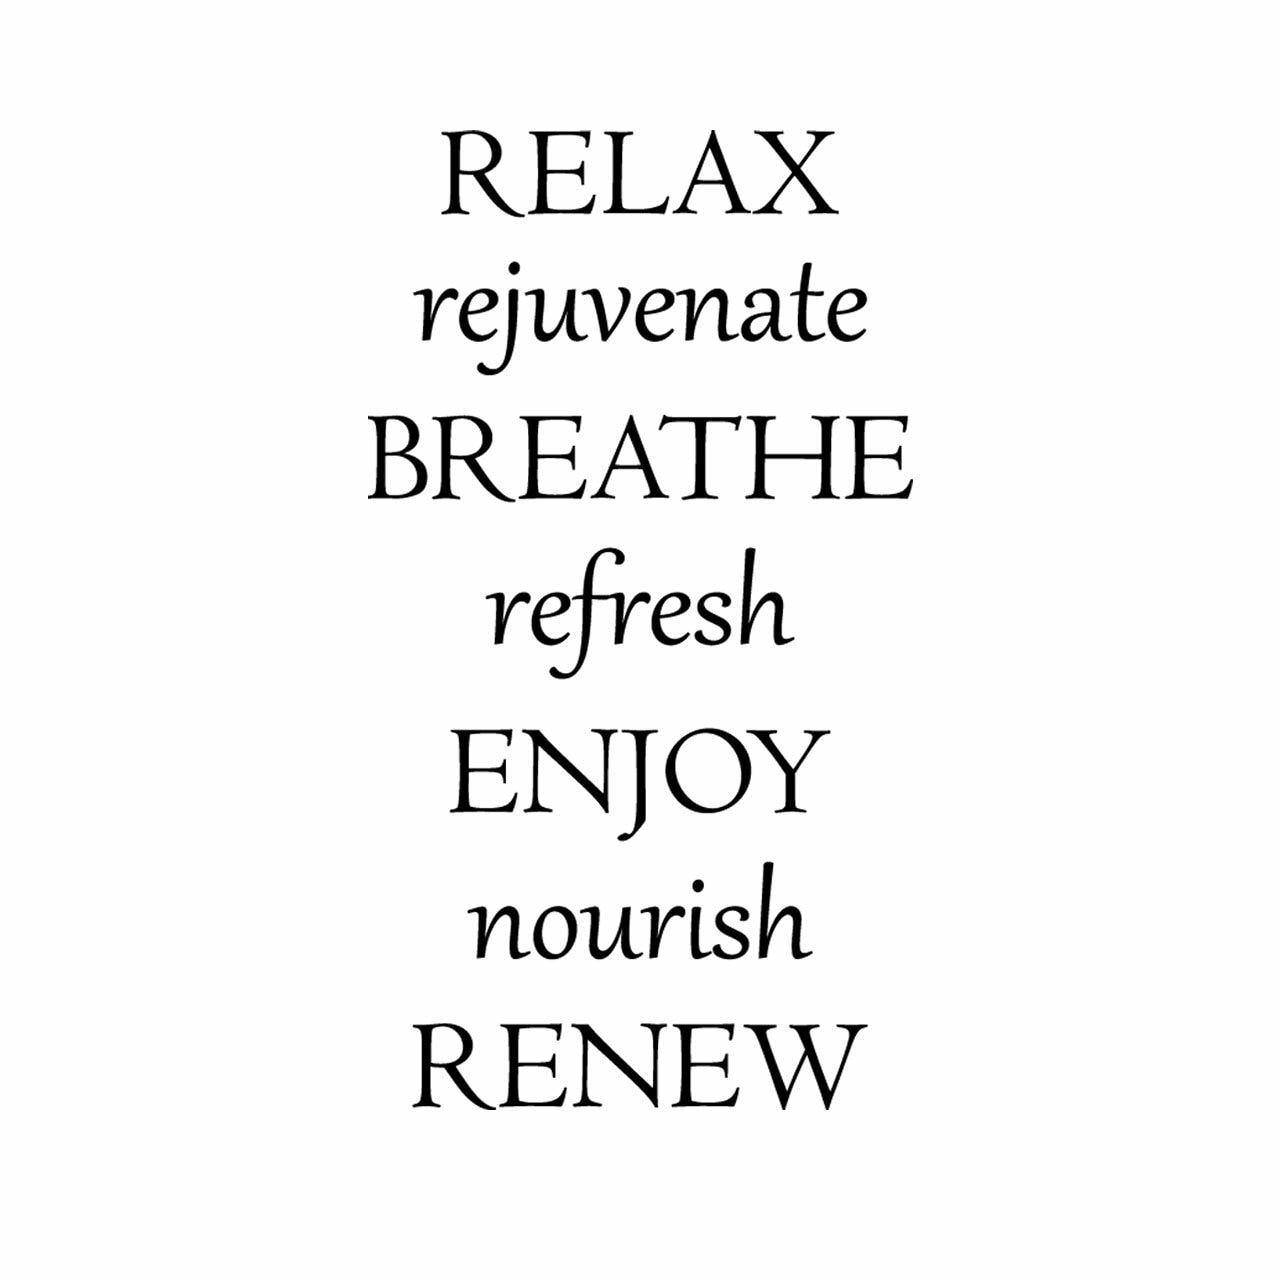 Relax Rejuvenate Breathe Refresh Enjoy Nourish Renew vinyl saying in black on a white background